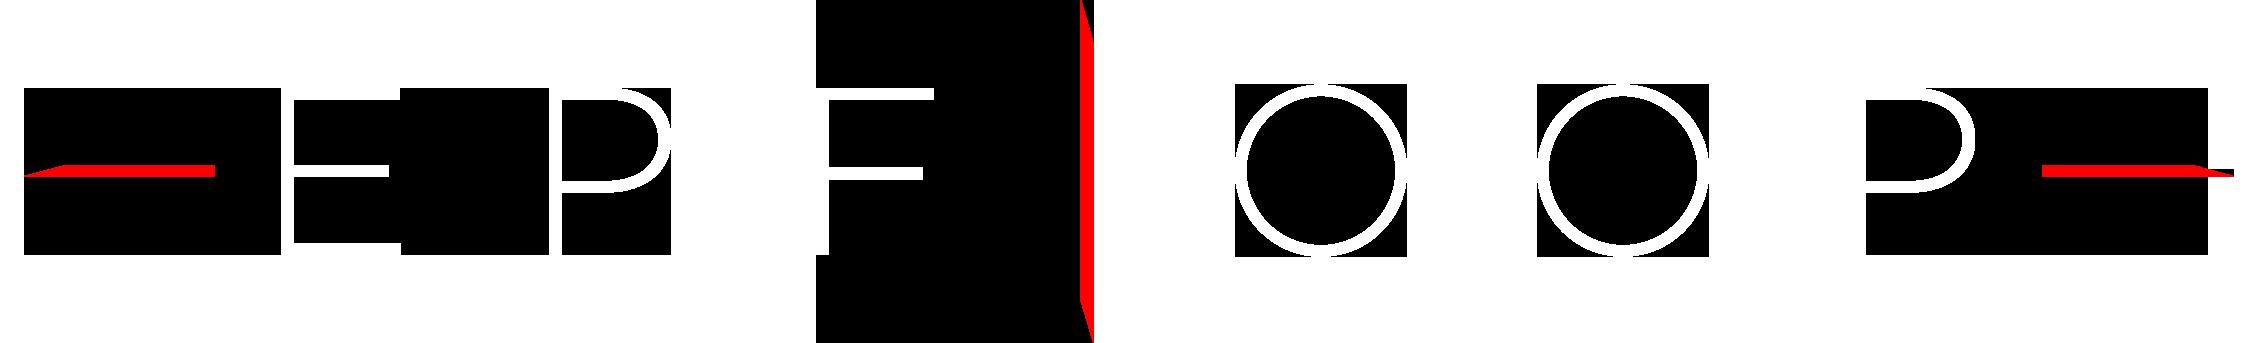 EPFLoop logo font white